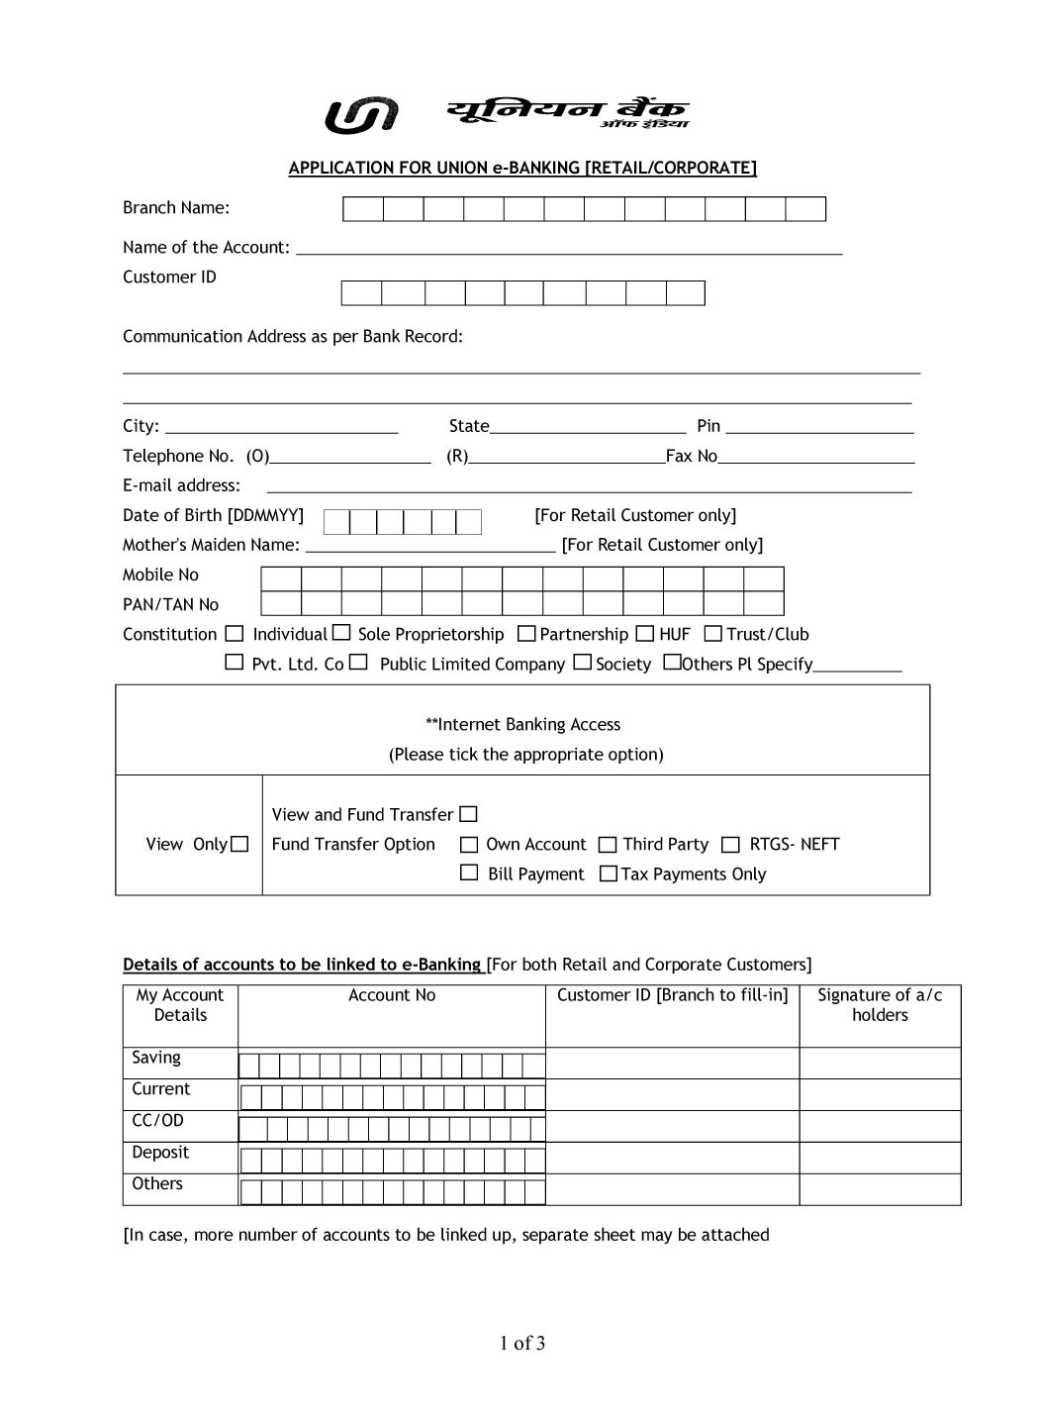 Sbi internet banking application form pdf